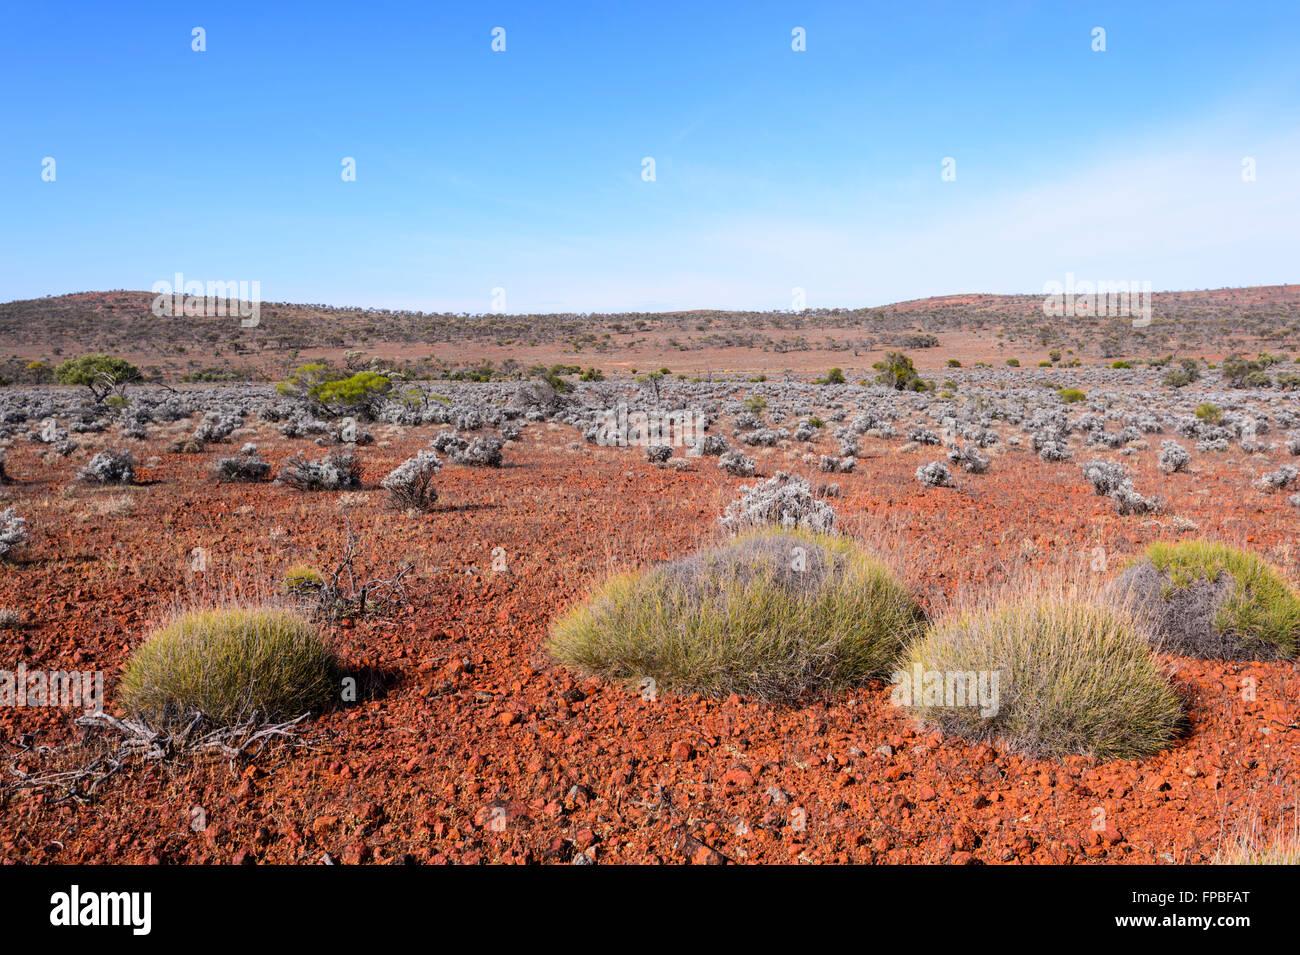 Outback near Lake Gairdner, South Australia, Australia - Stock Image